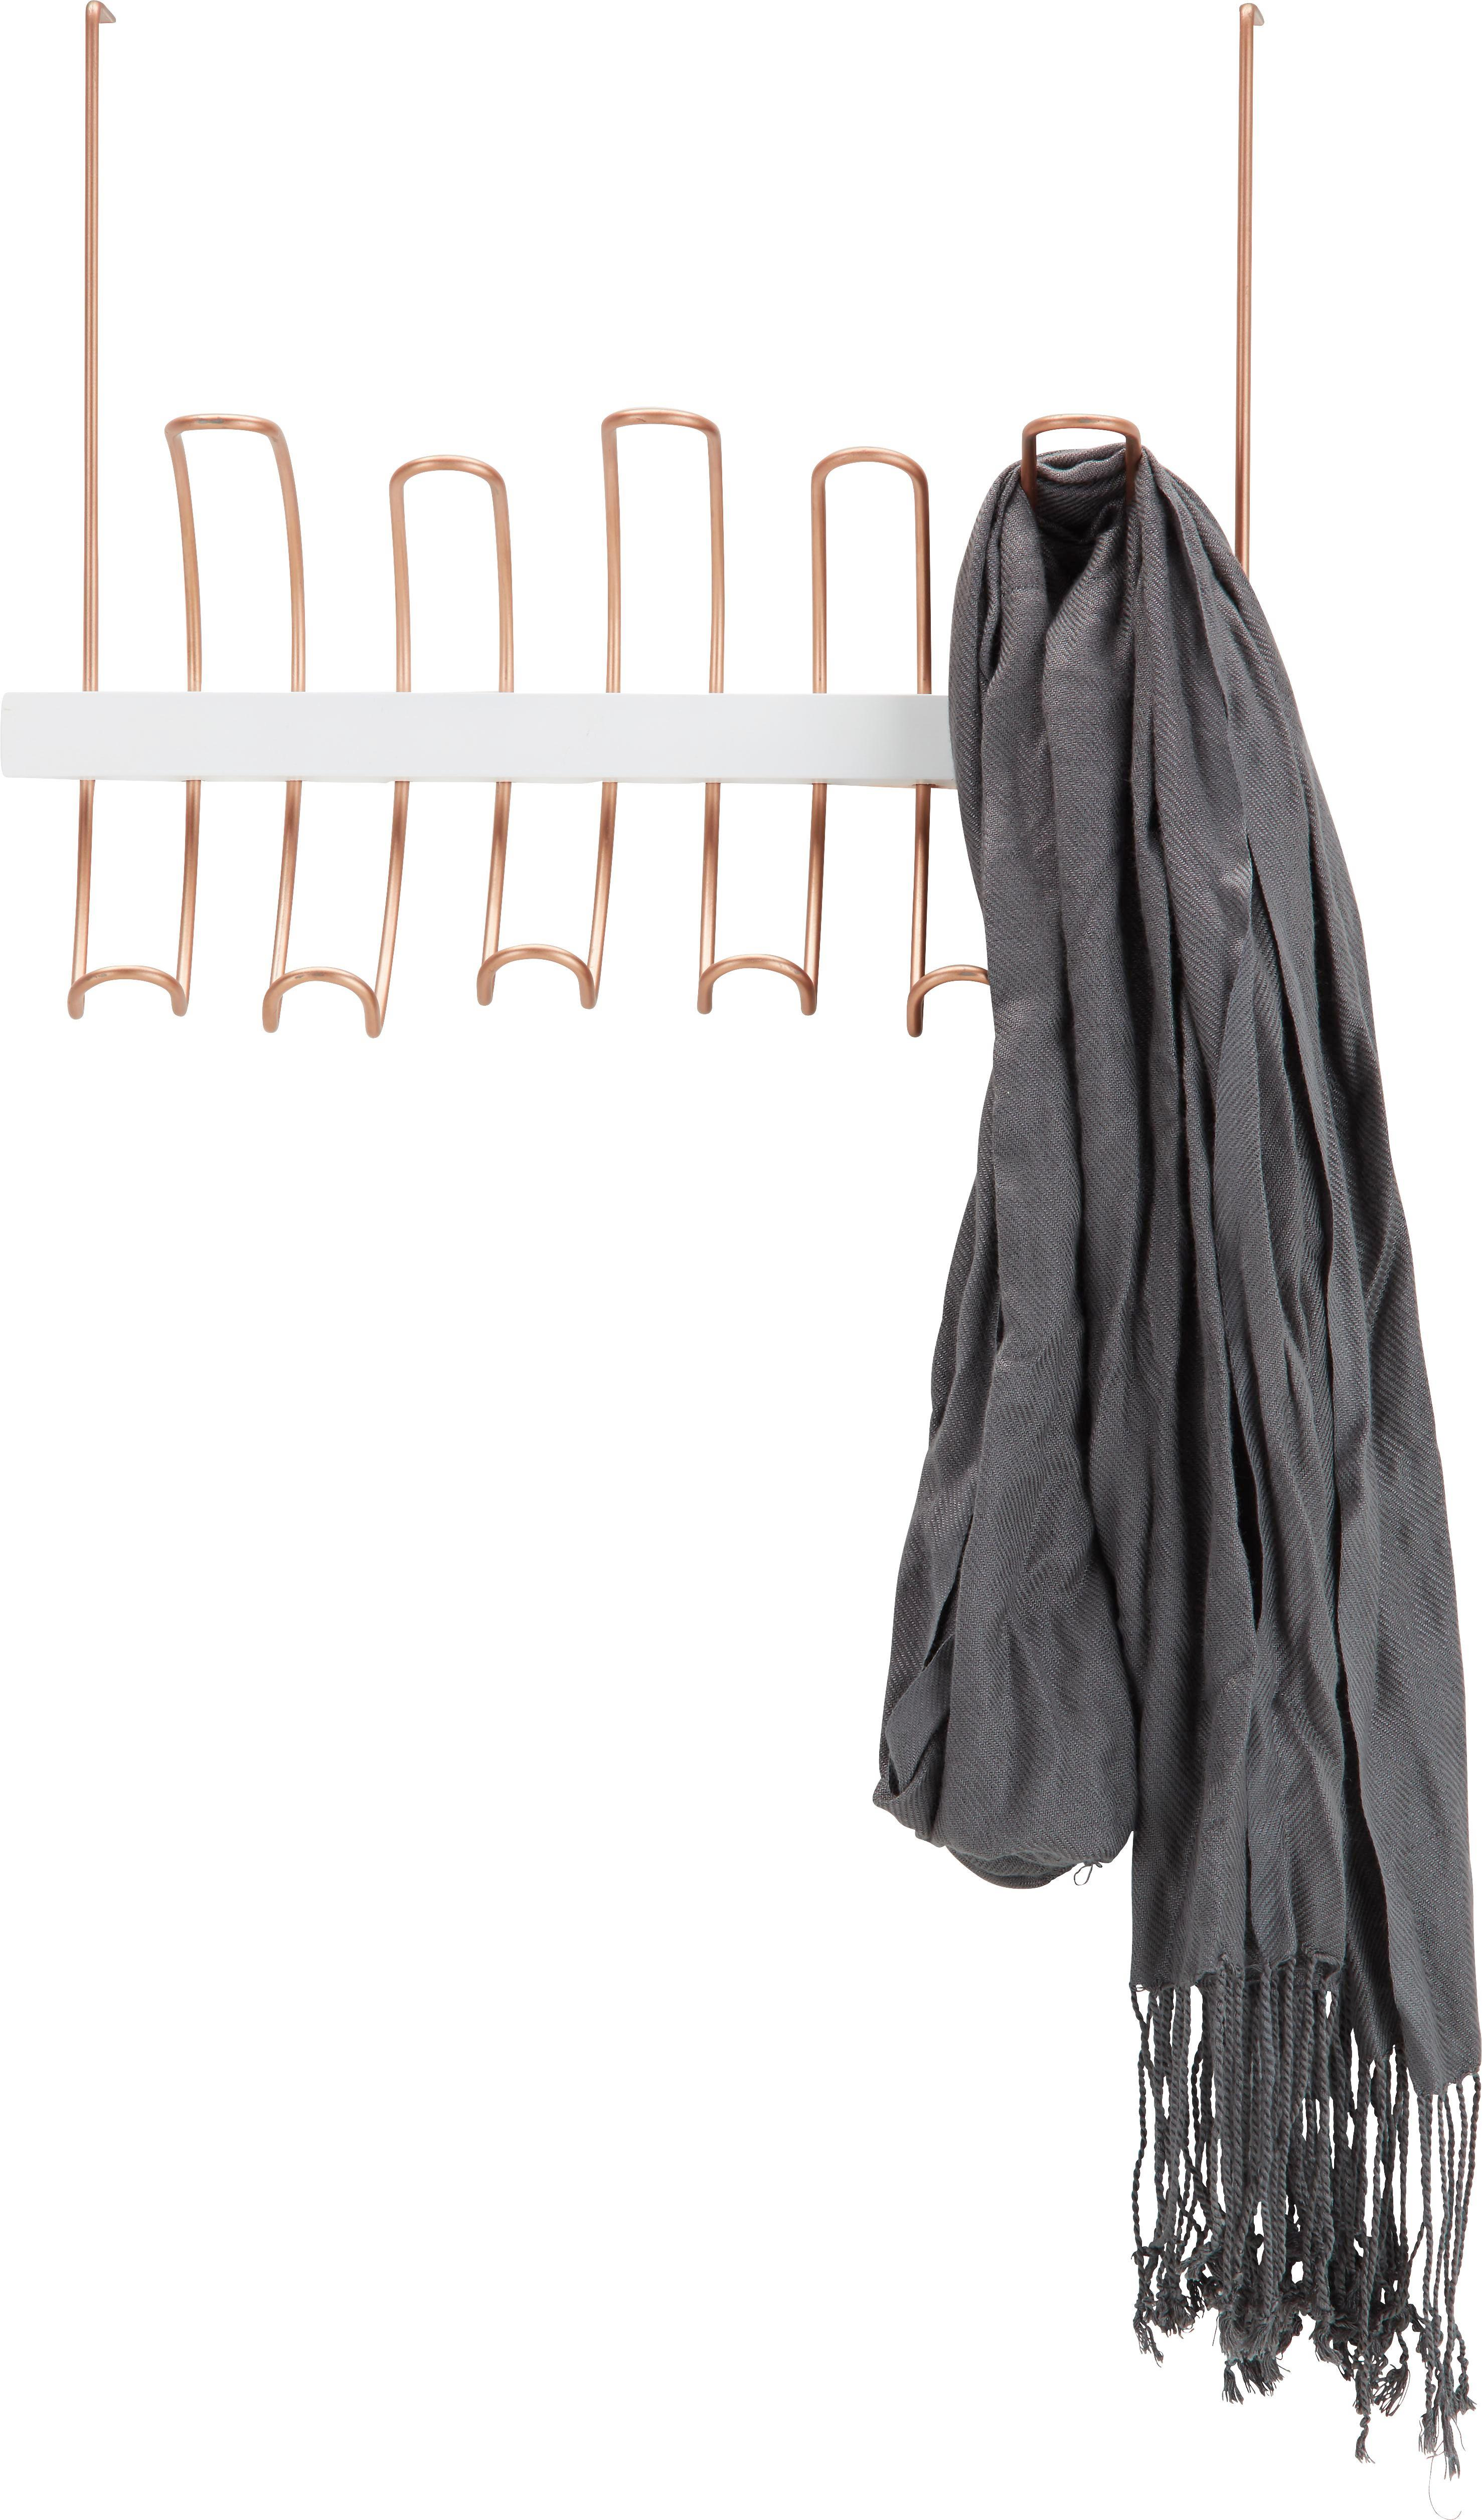 Hakenleiste aus Echtholz In Rose - Altrosa/Weiß, Holz/Metall (41,540/32/10cm)